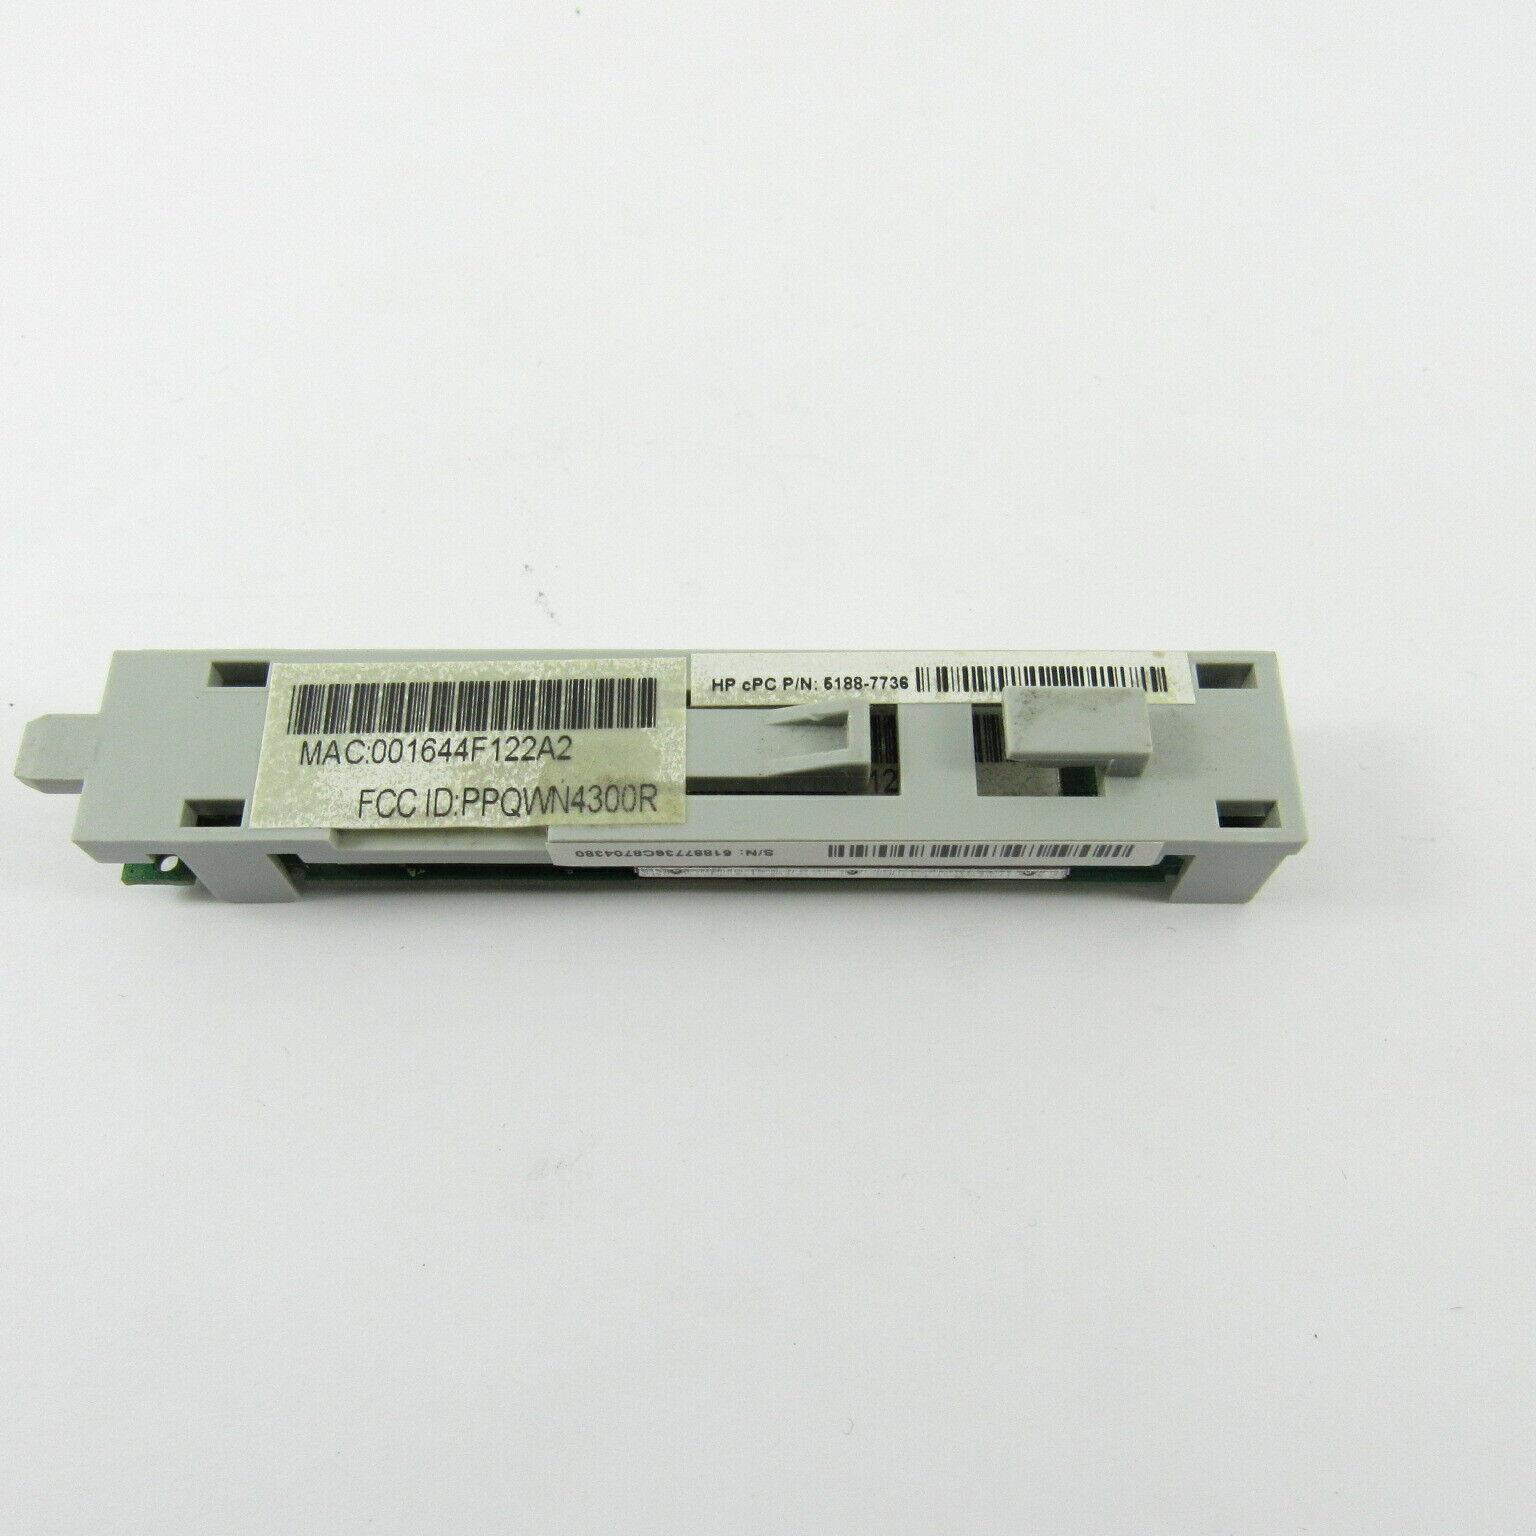 USB 2.0 Wireless WiFi Lan Card for HP-Compaq Pavilion Slimline S5570t